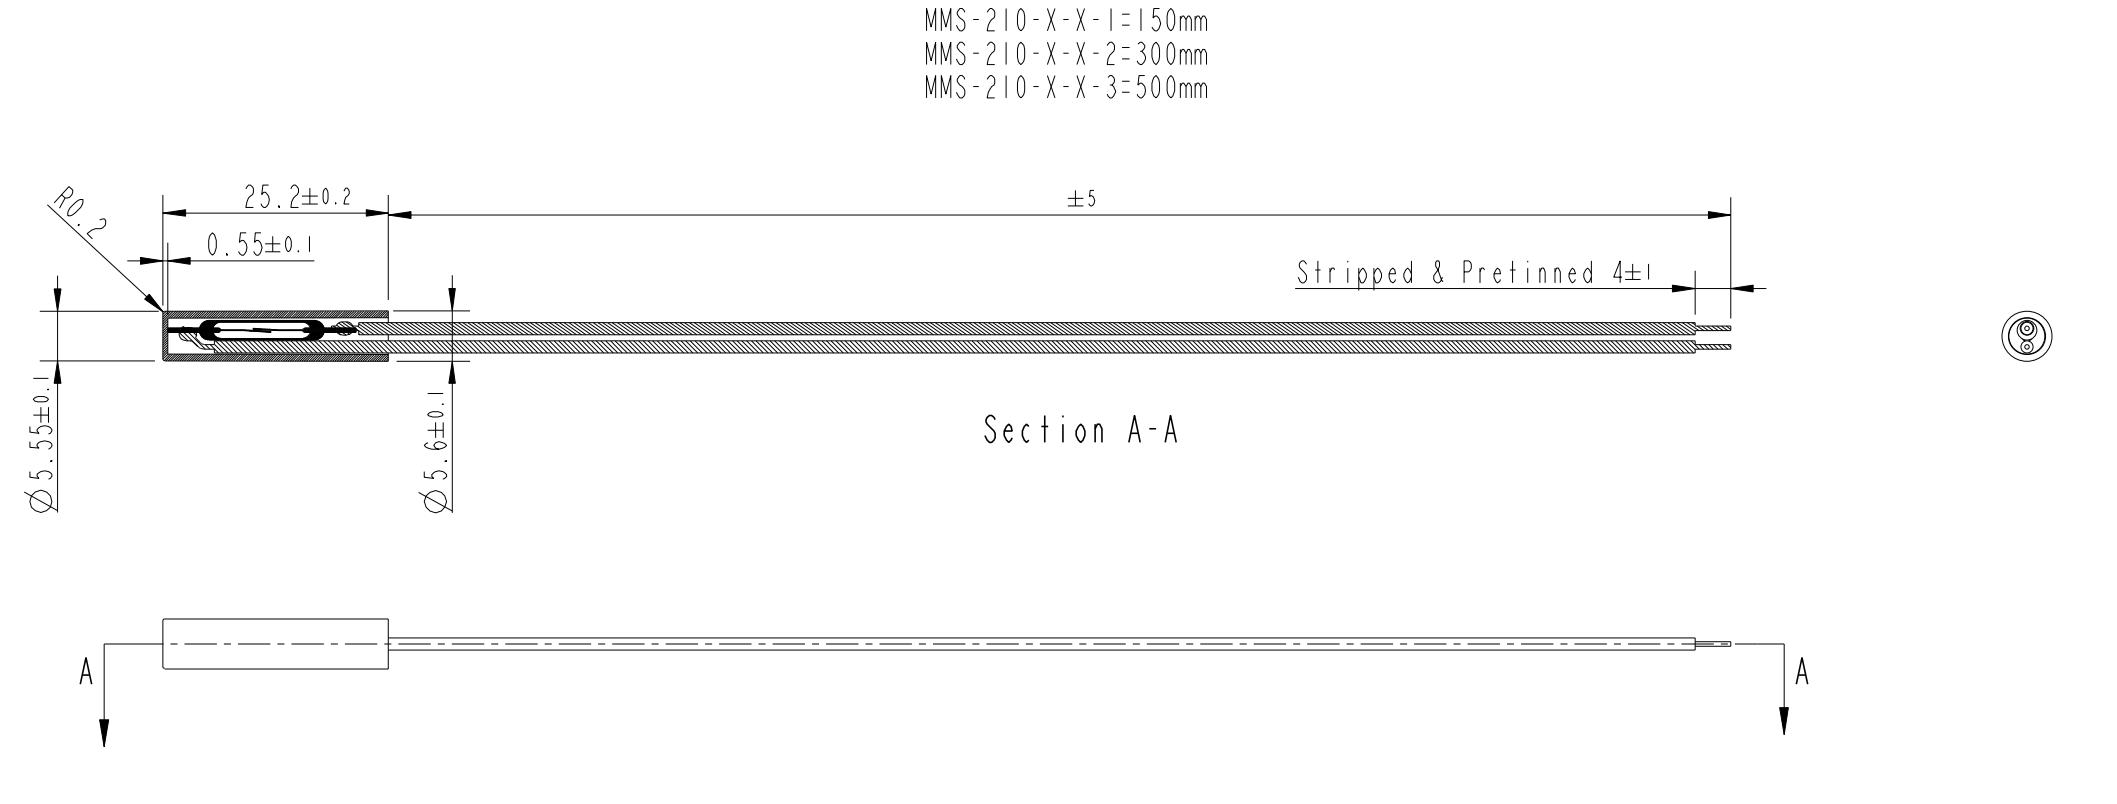 MMS-210